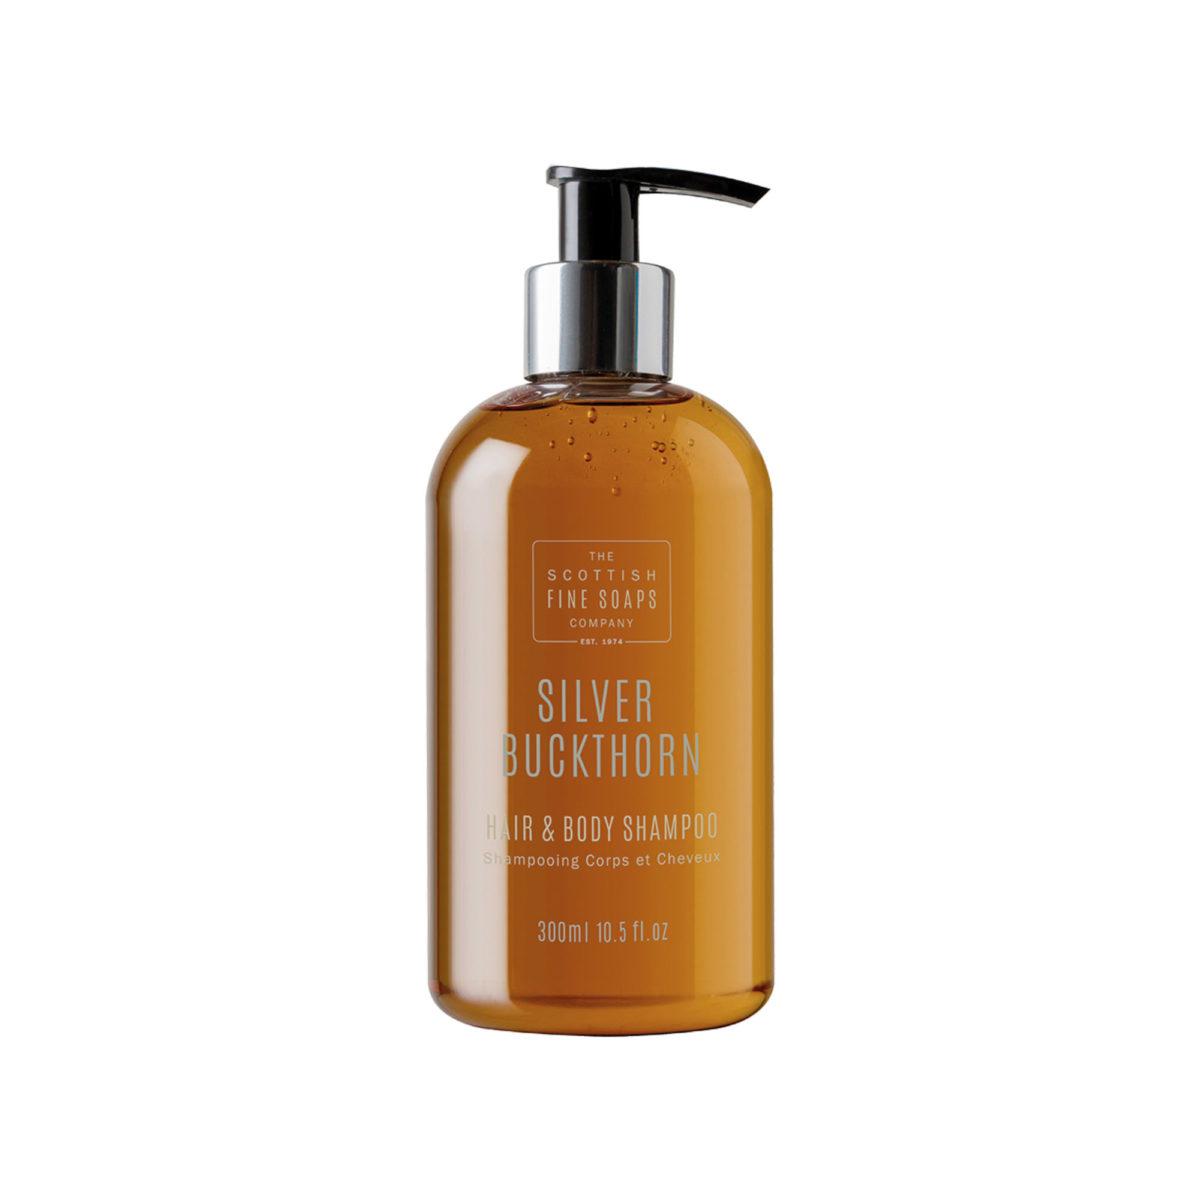 Silver Buckthorn Hair & Body Shampoo